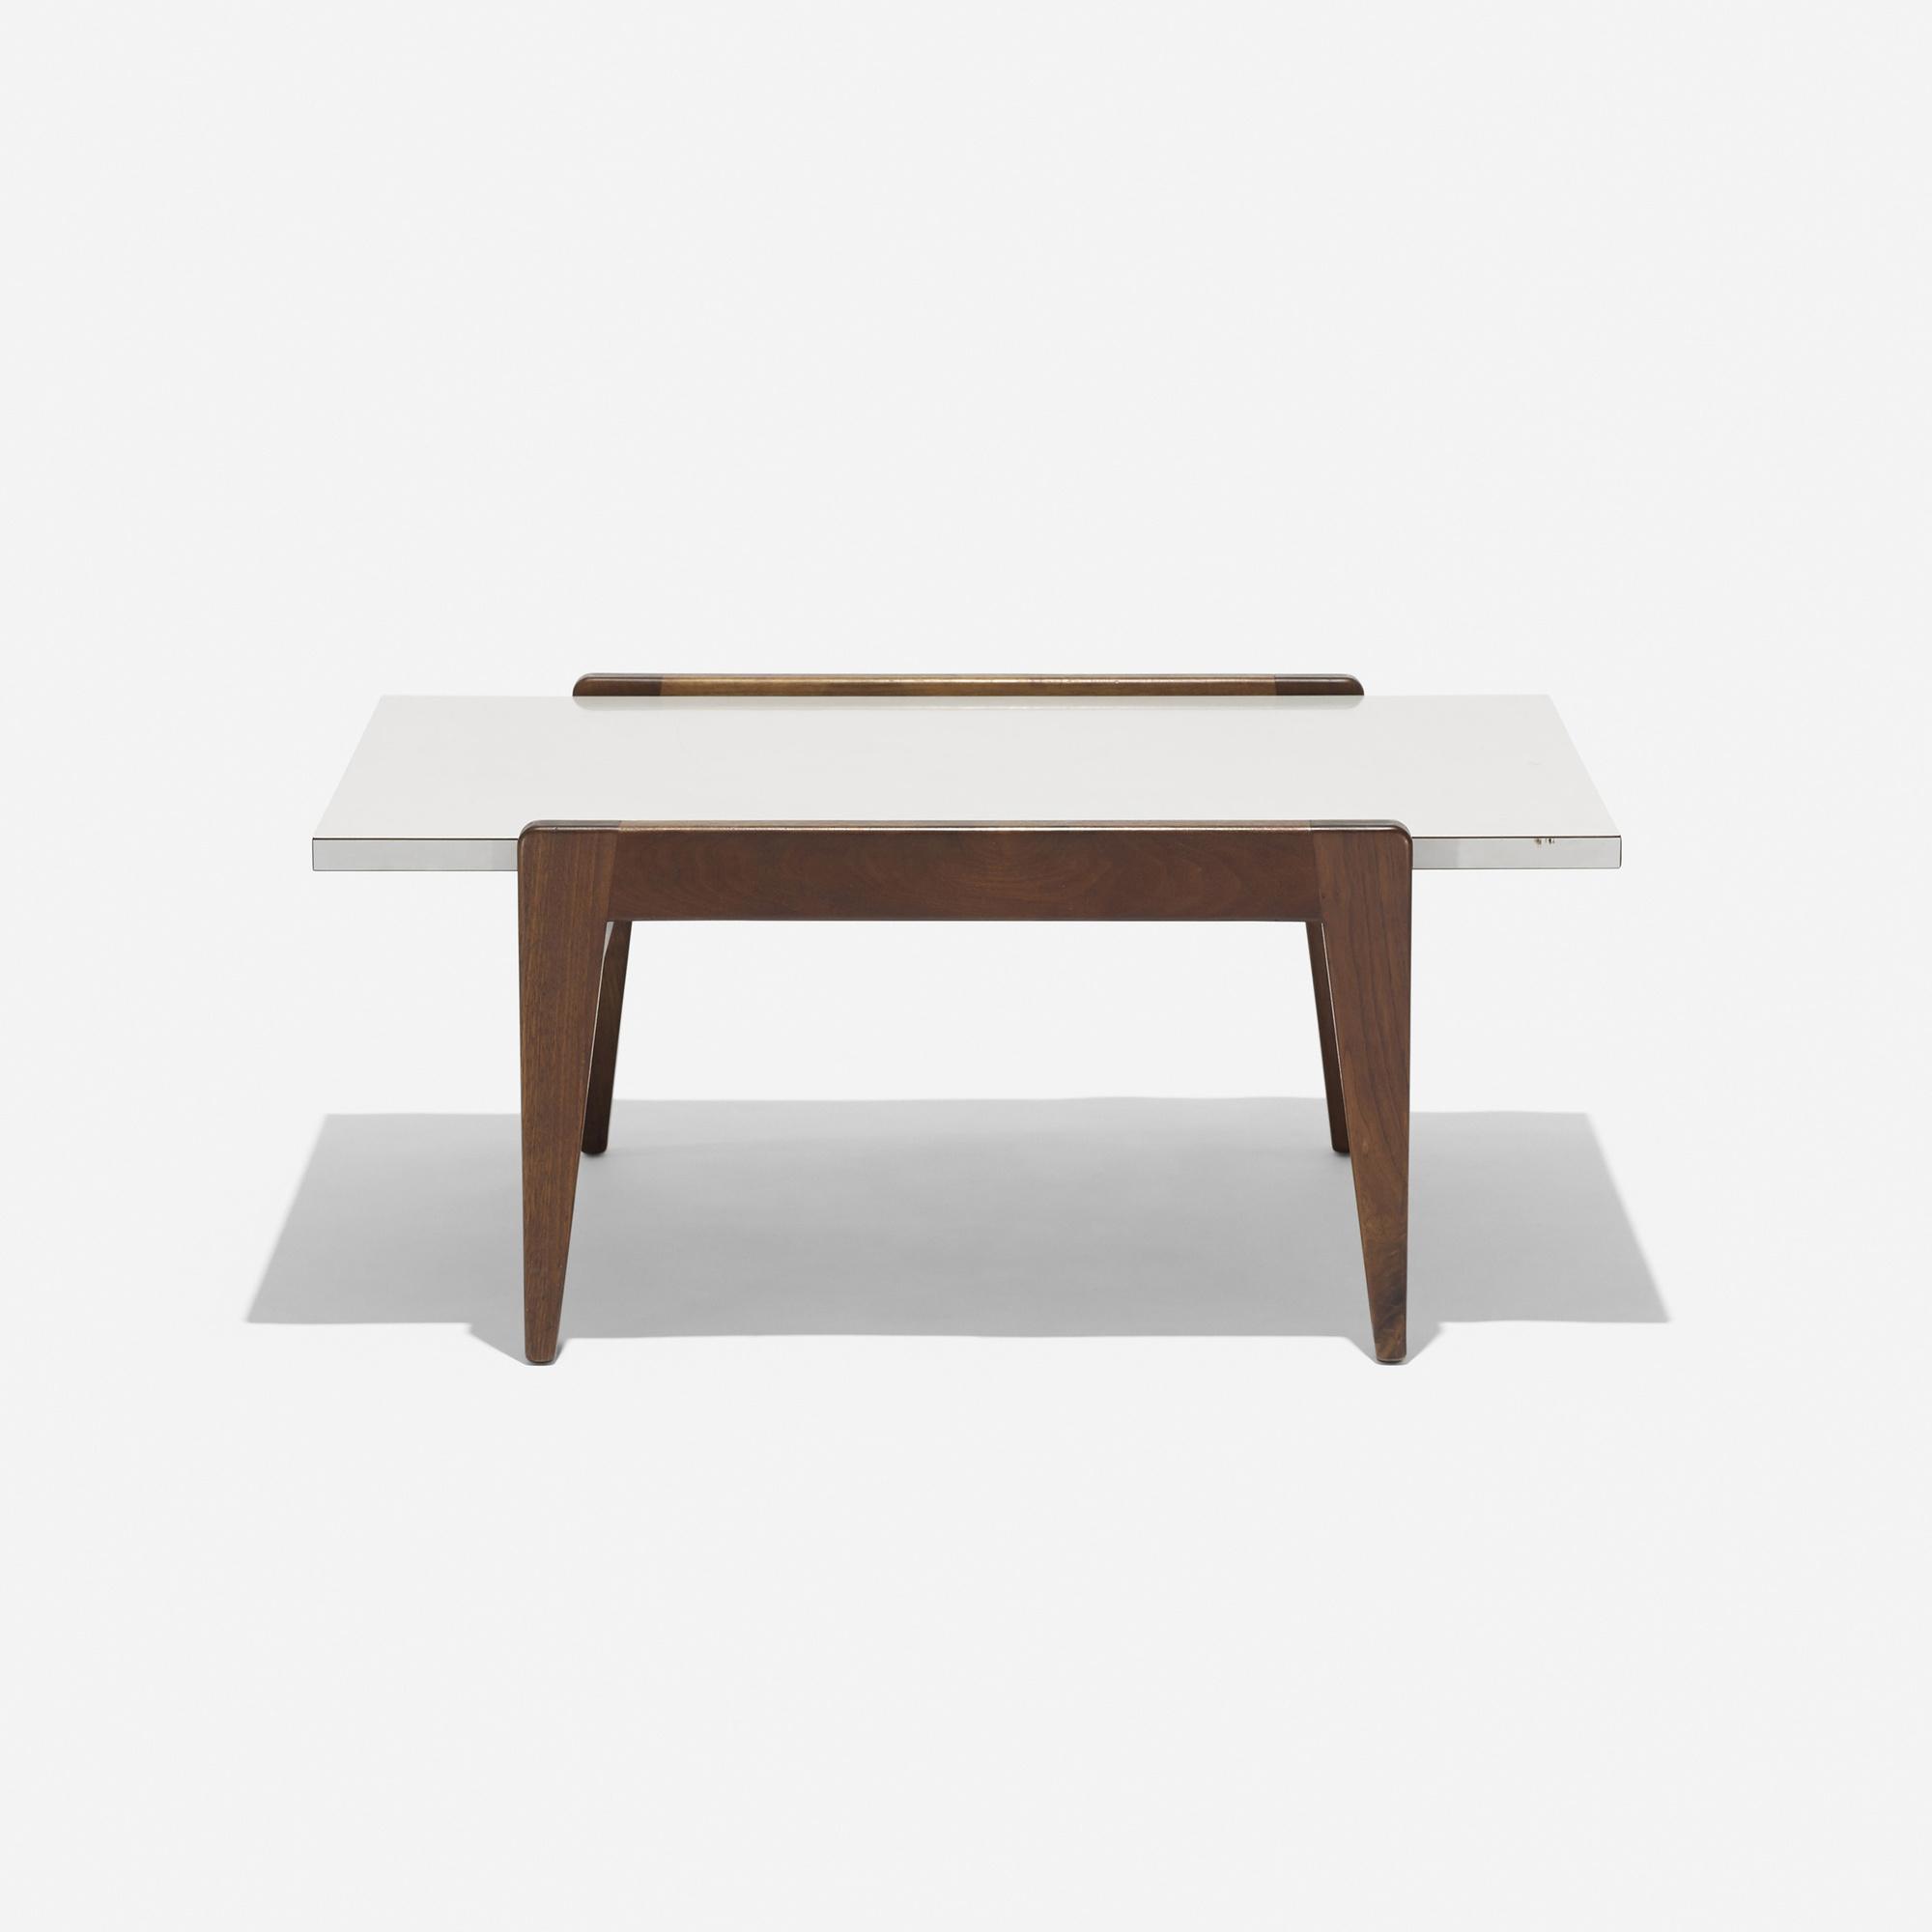 116 jens risom coffee table american design 11 february 2016 116 jens risom coffee table 2 of 3 geotapseo Choice Image